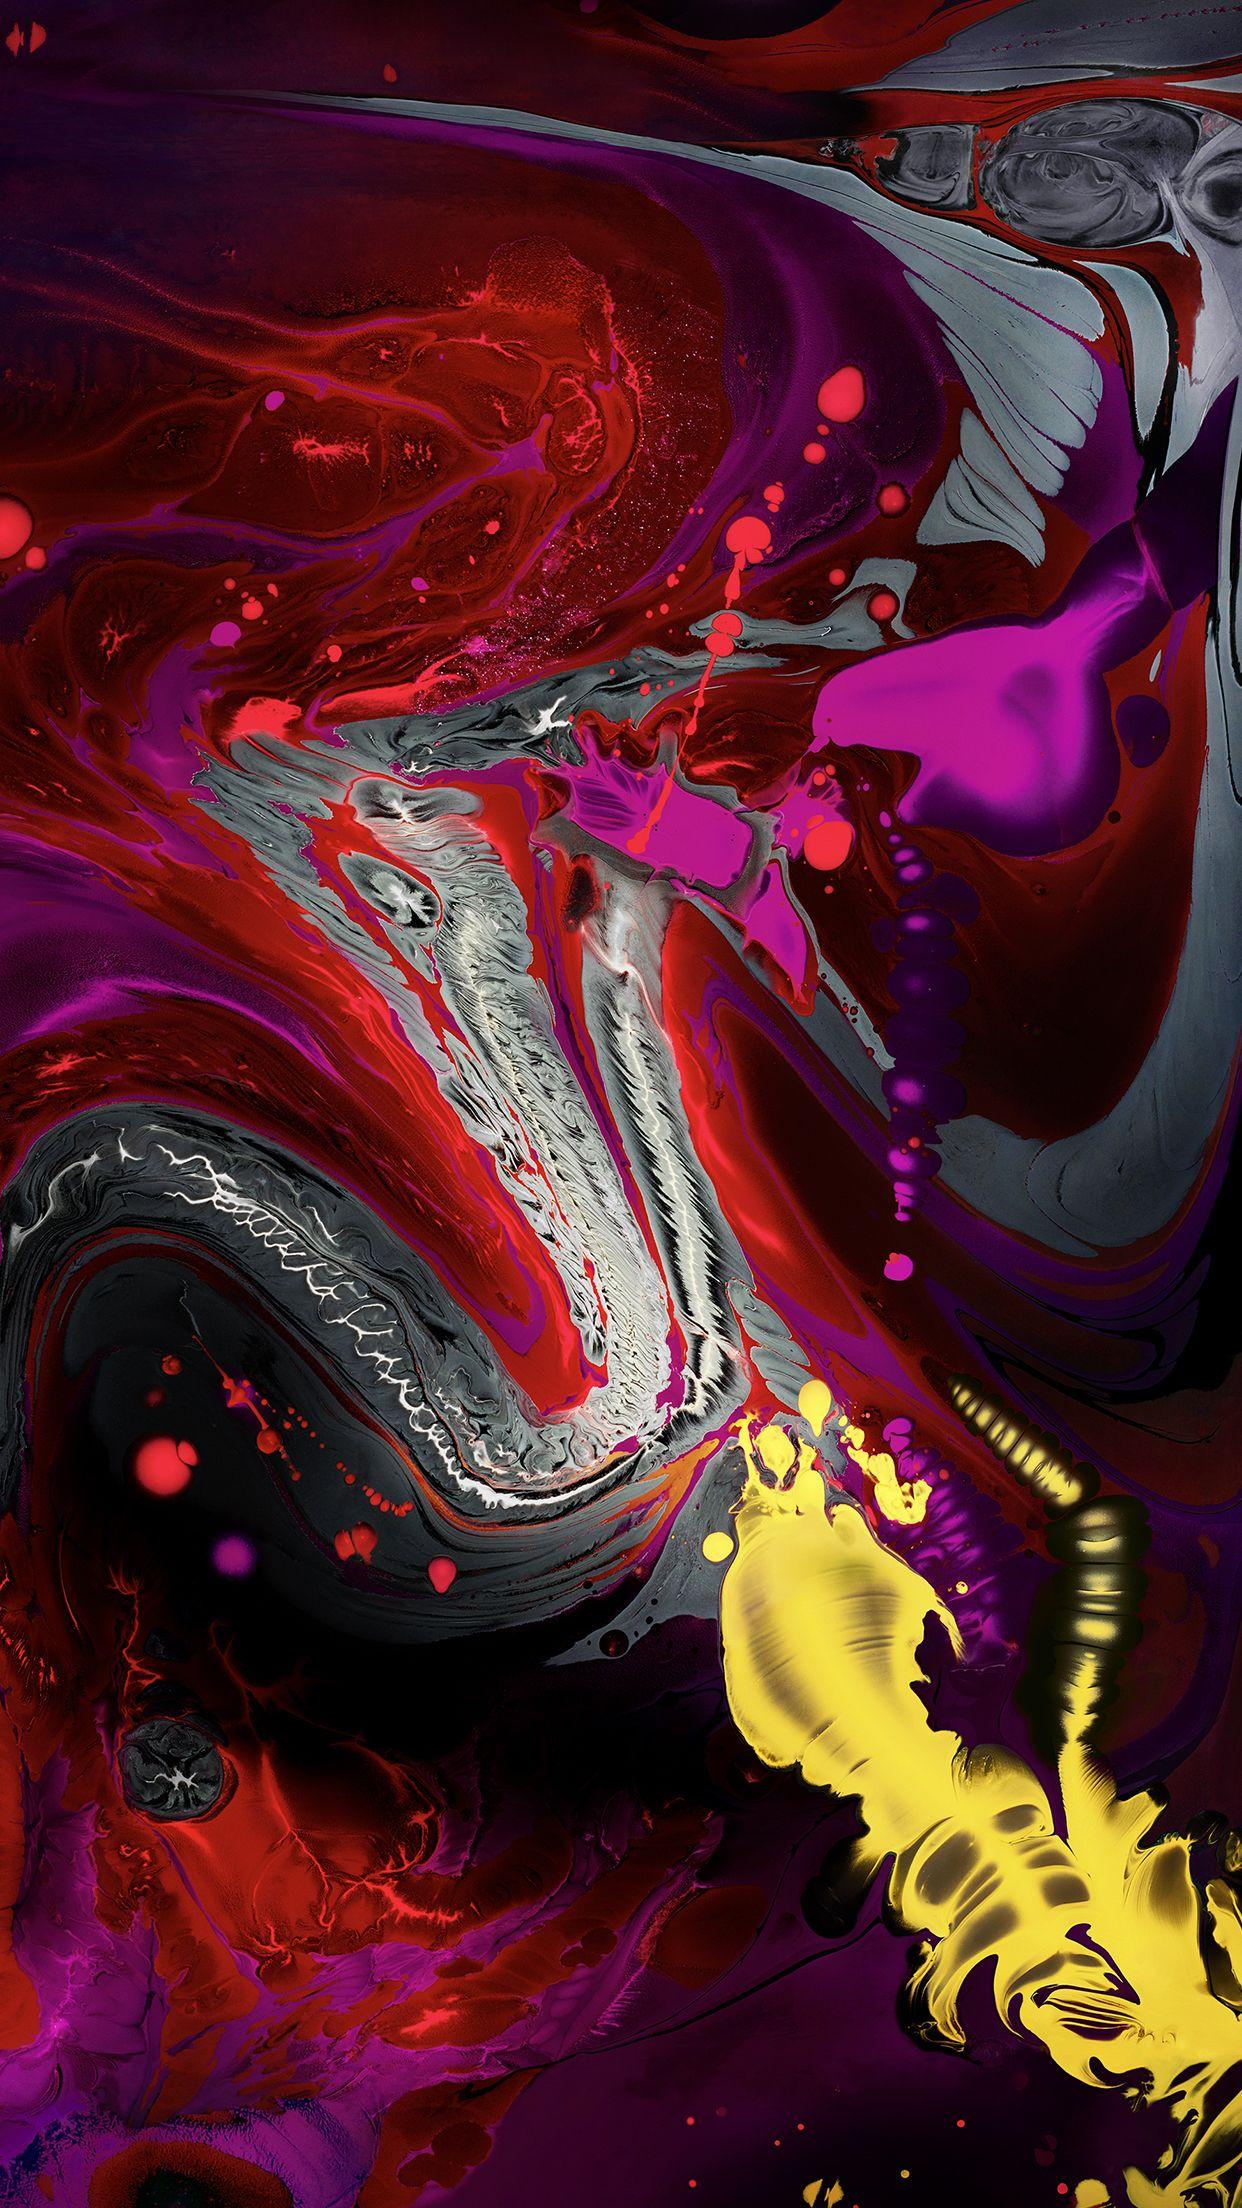 Pin by Alex Solanki on Wallpapers Ipad pro wallpaper, Hd